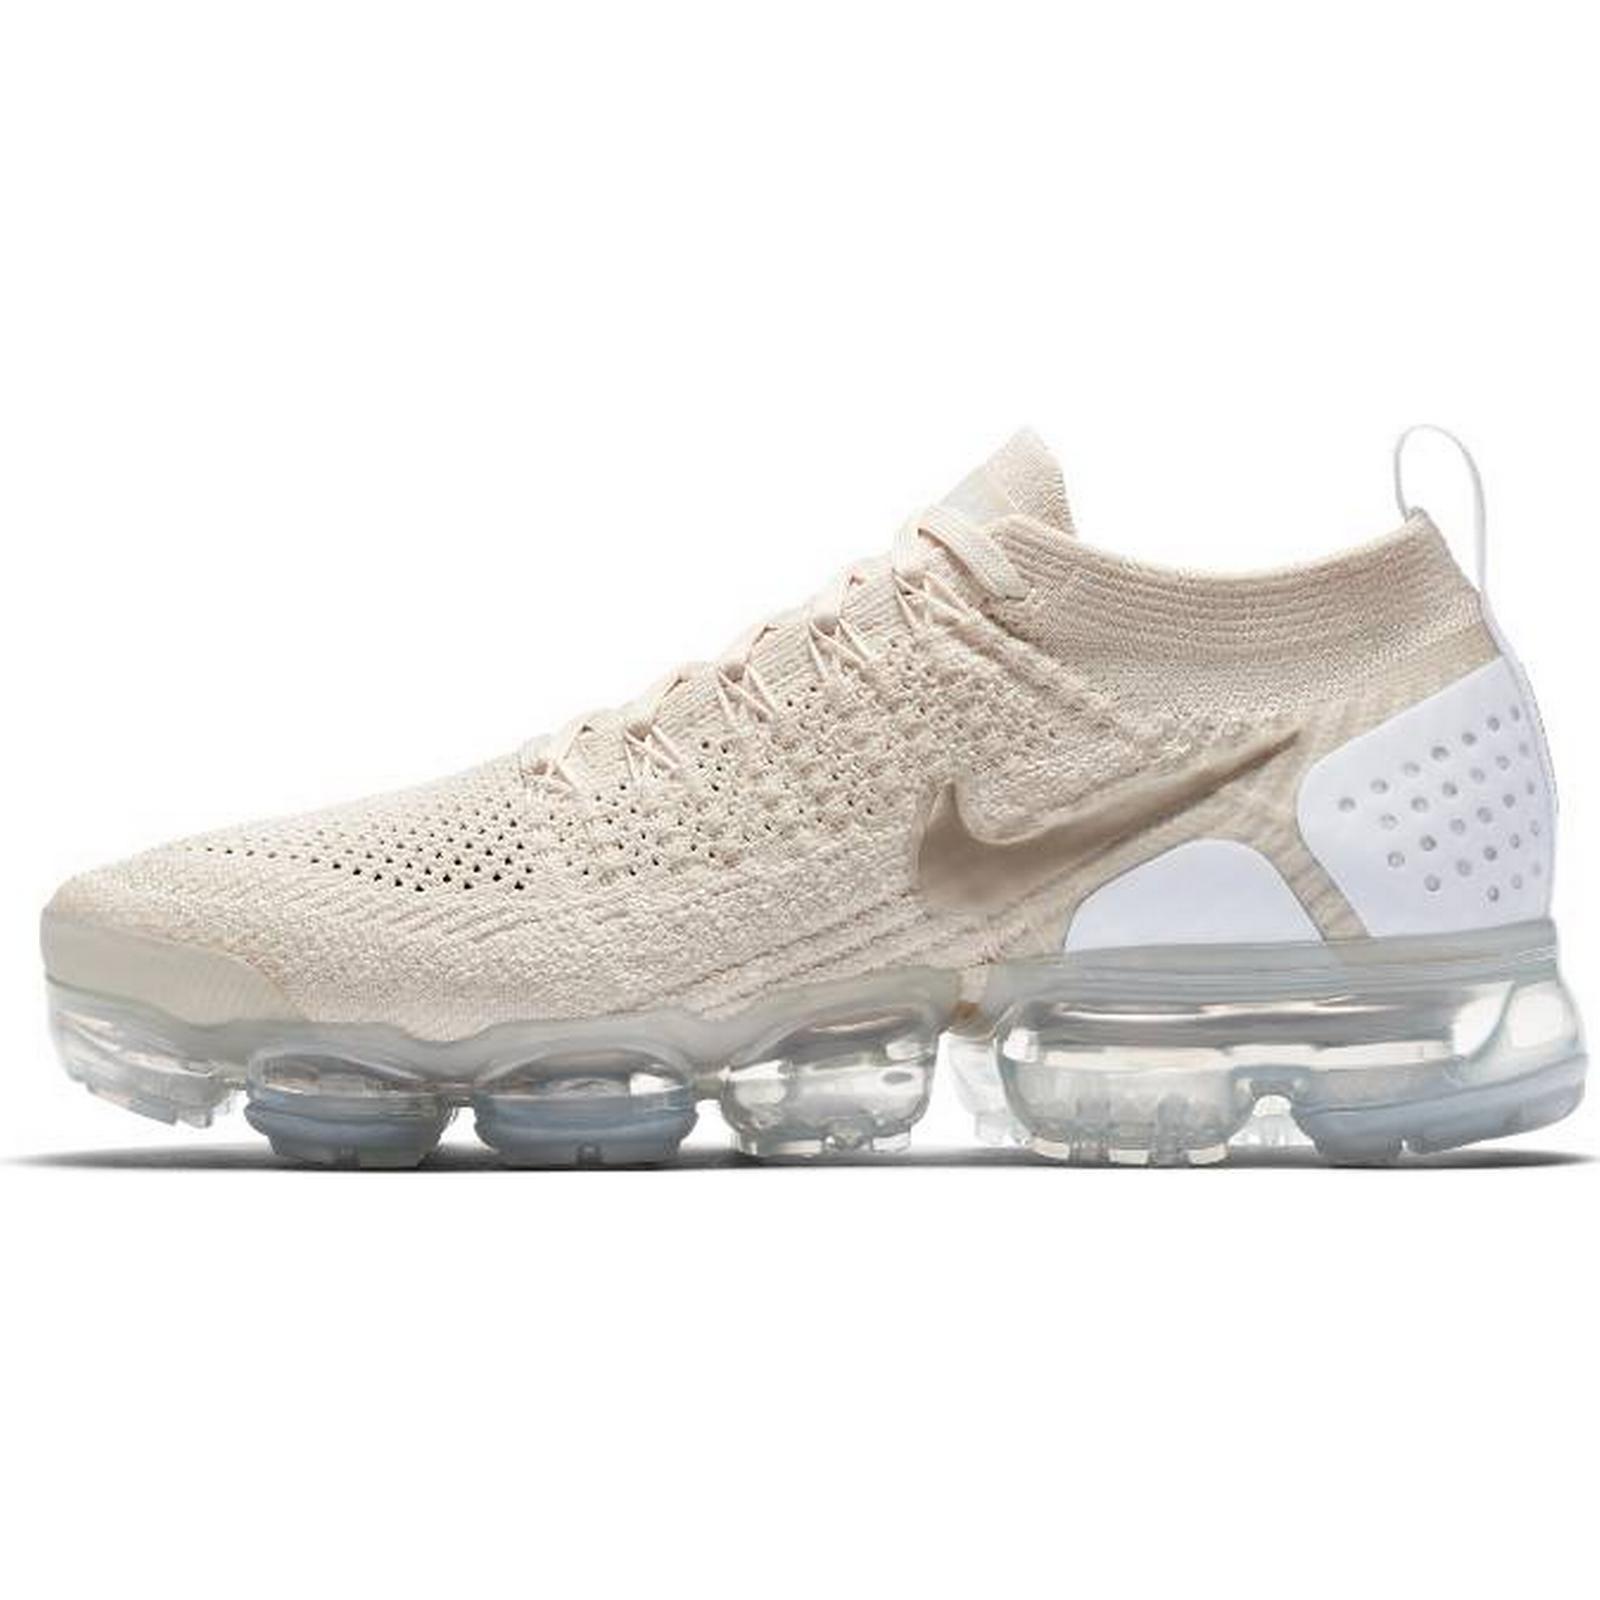 Man's/Woman's : NIKE Damskie Buty Do Biegania 2 Nike Air VaporMax Flyknit 2 Biegania :  Promotions 3e776e